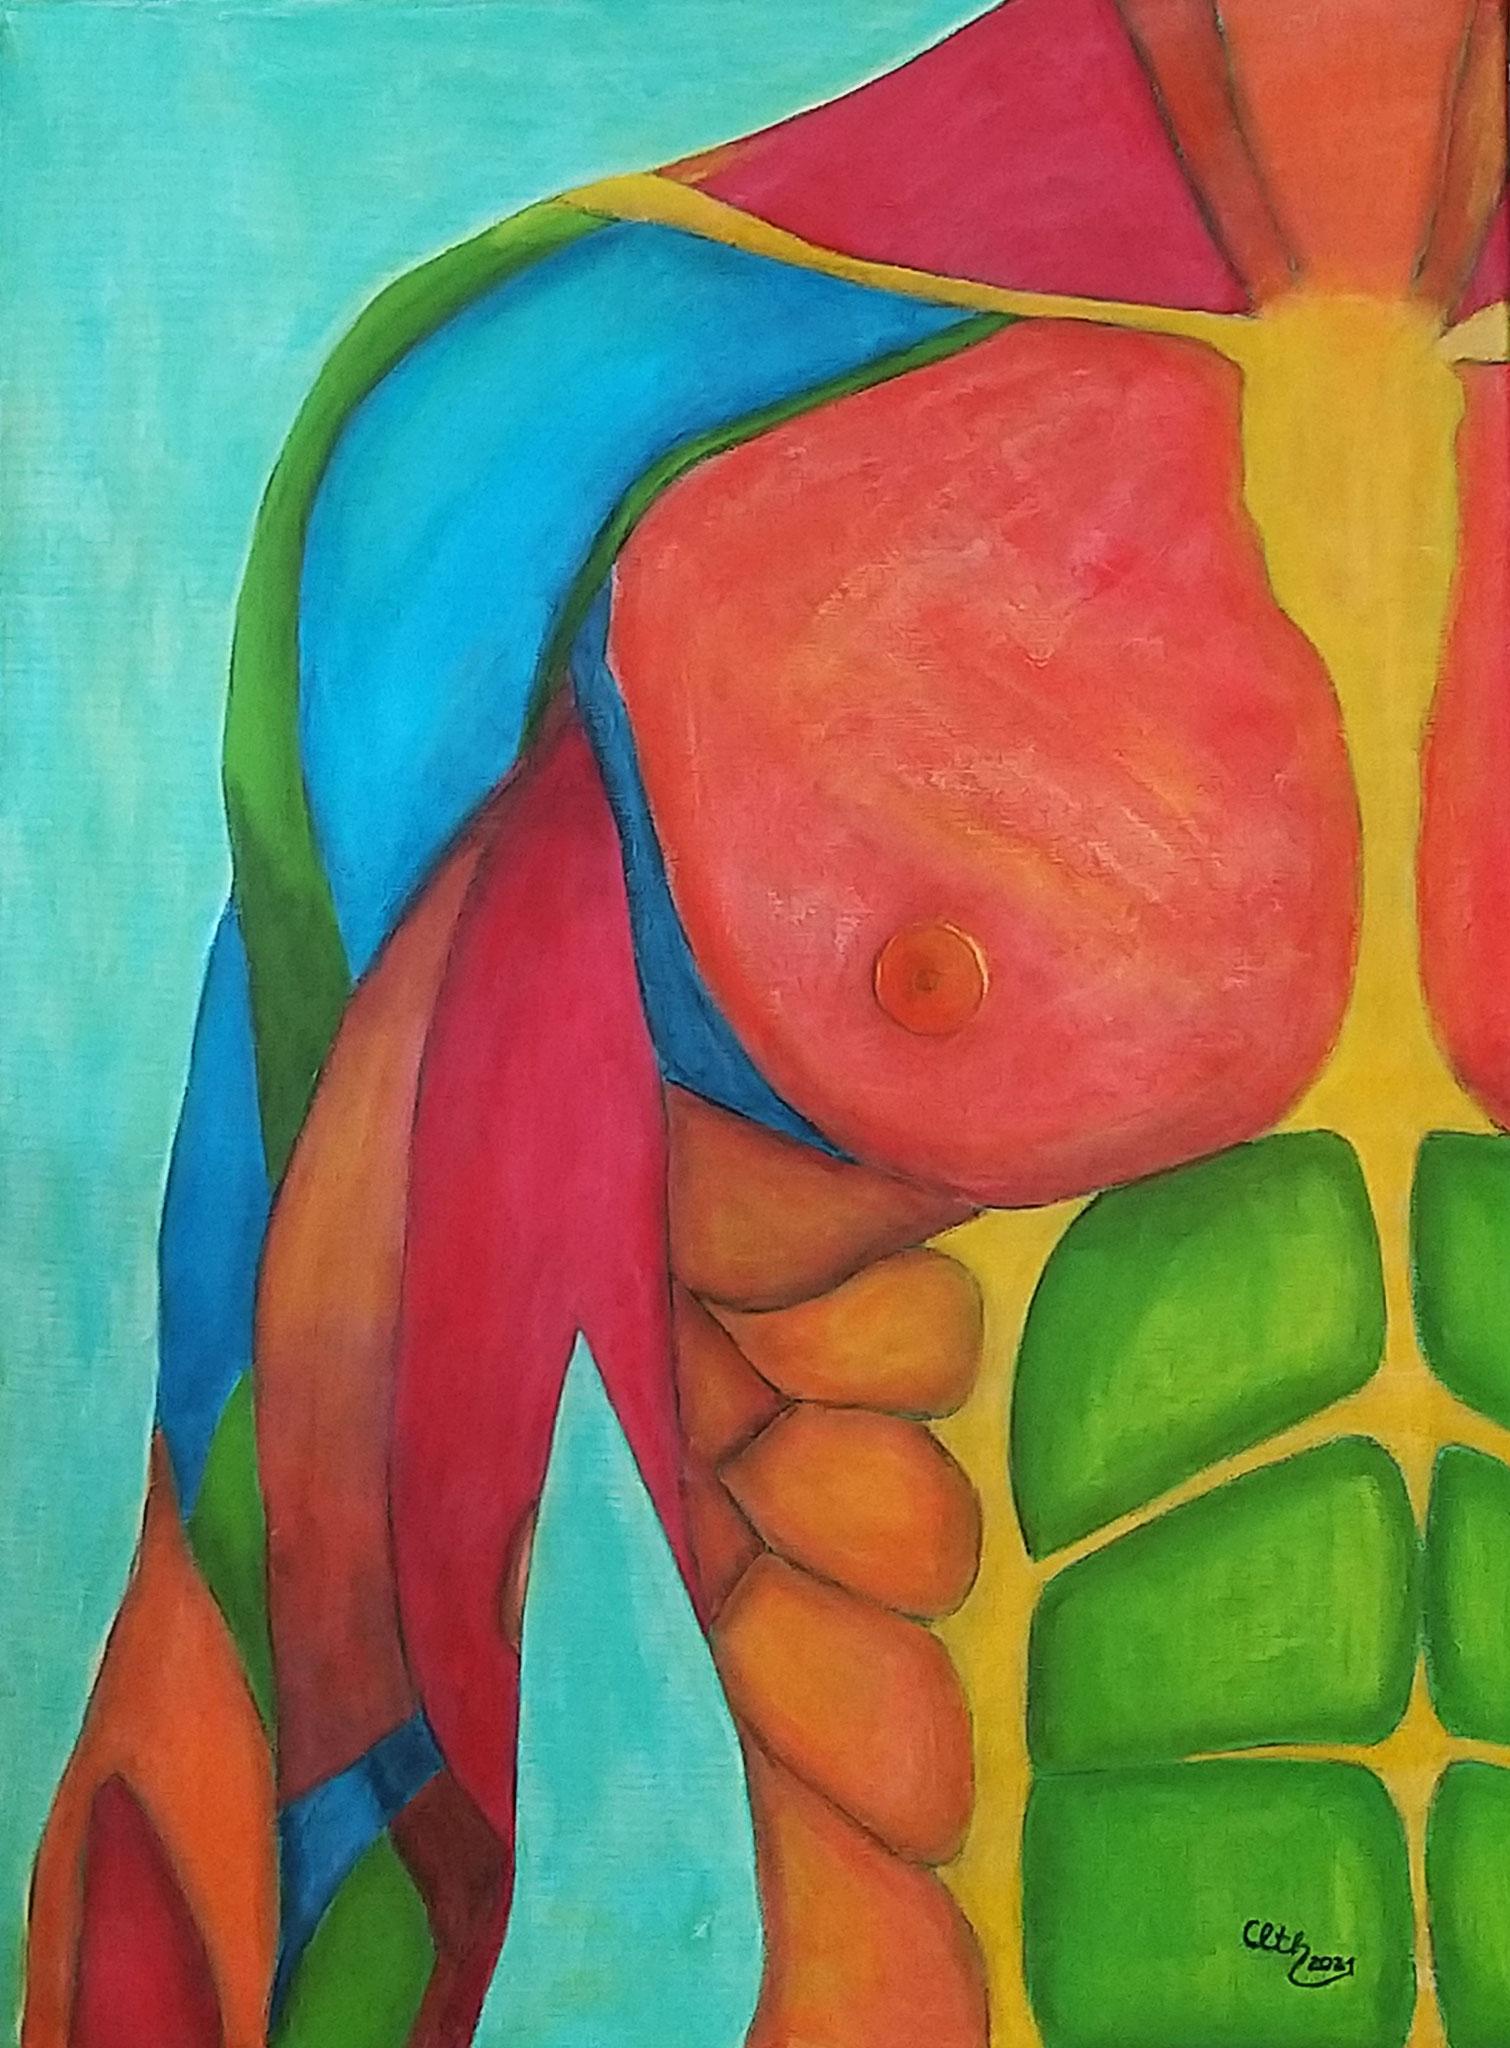 Kraft, 60 x 80 cm, Acryl auf Leinwand, 2021